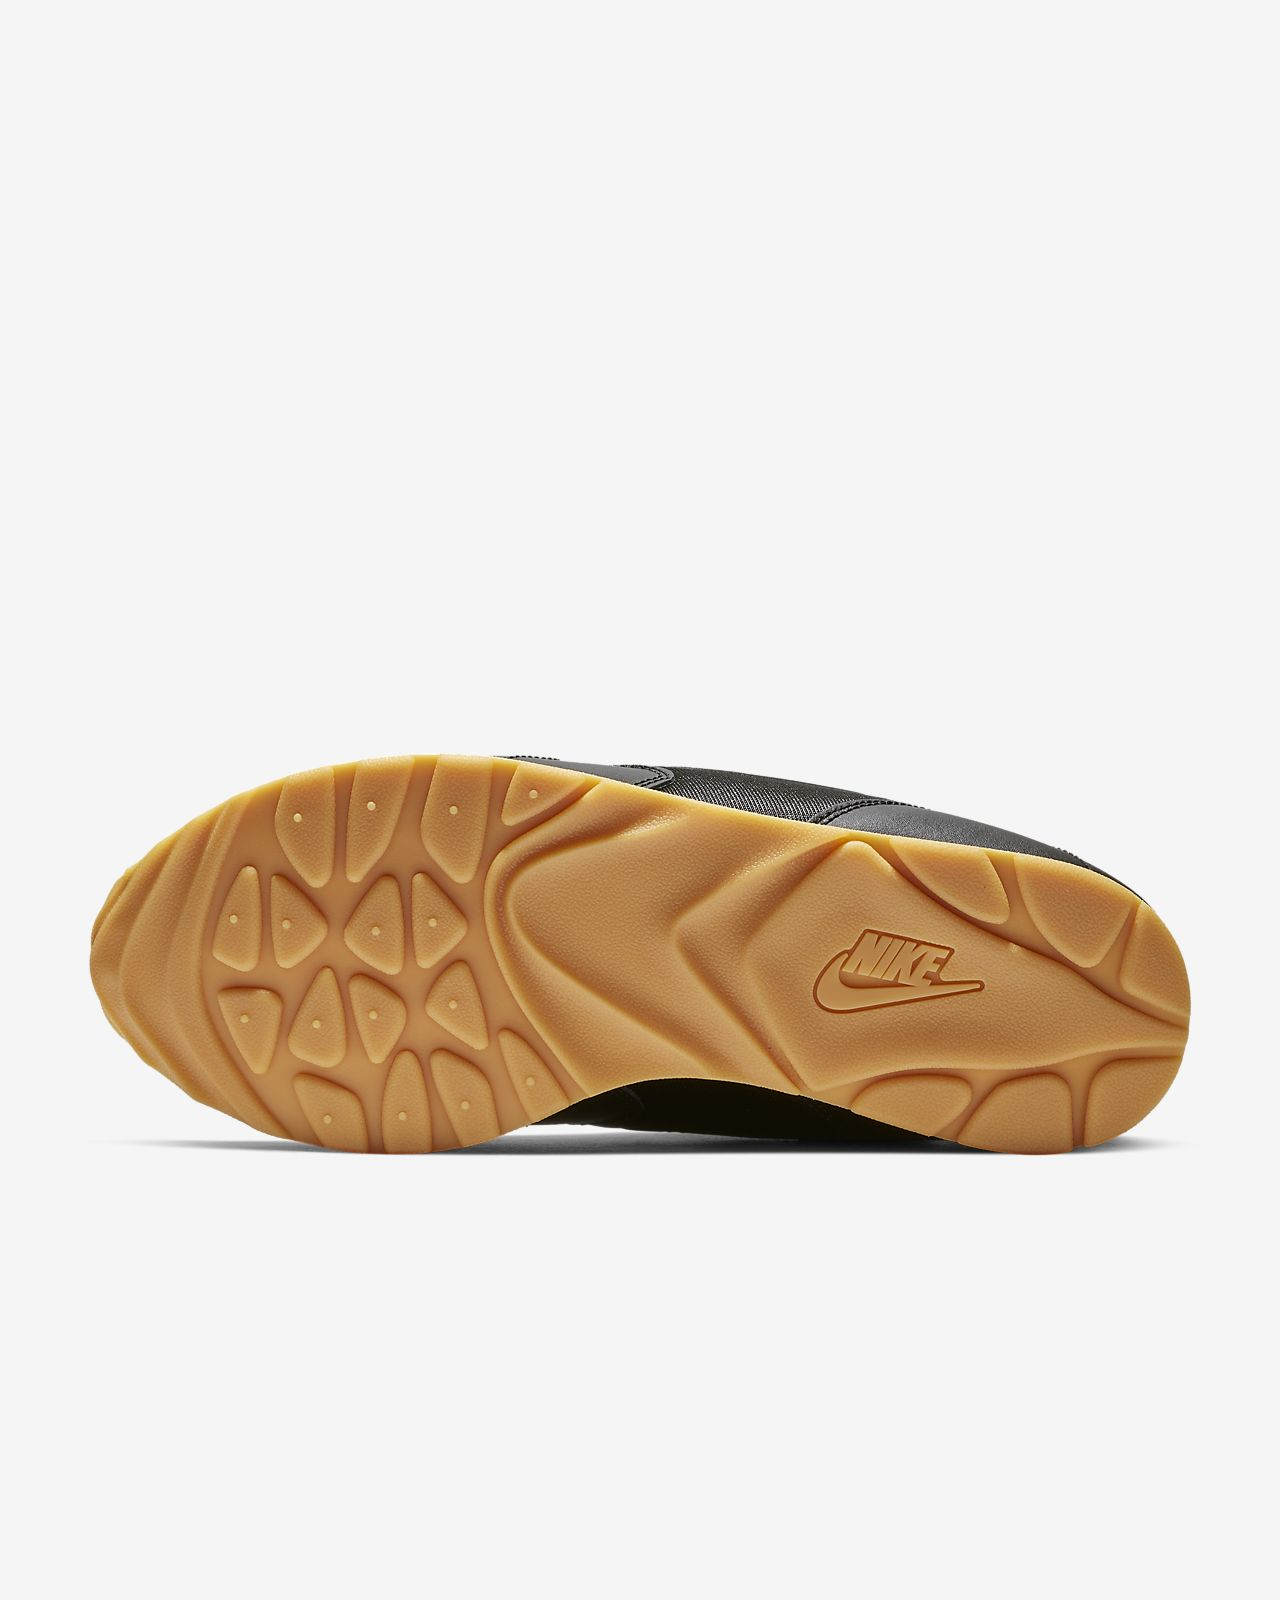 39272455 Low Resolution Nike Outburst Women's Shoe Nike Outburst Women's Shoe